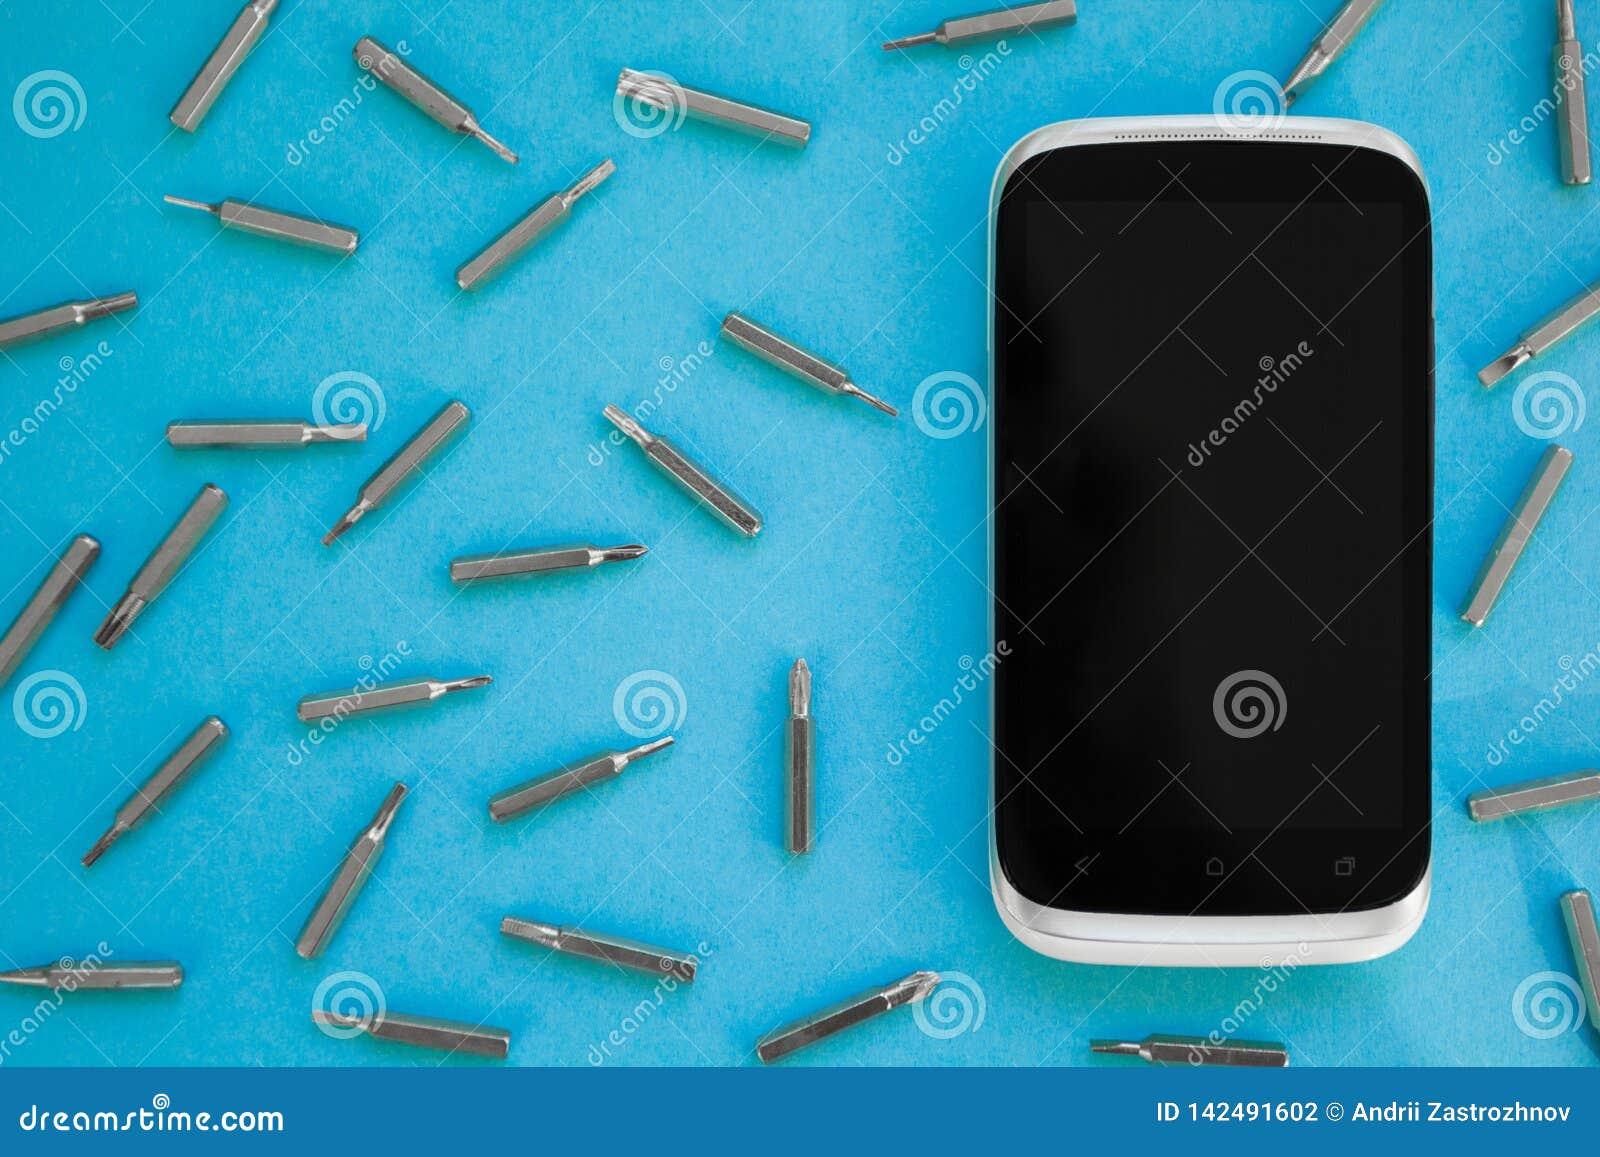 De mobiele telefoon die, vlakte legt, hoogste mening, blauwe achtergrond, concept herstellen